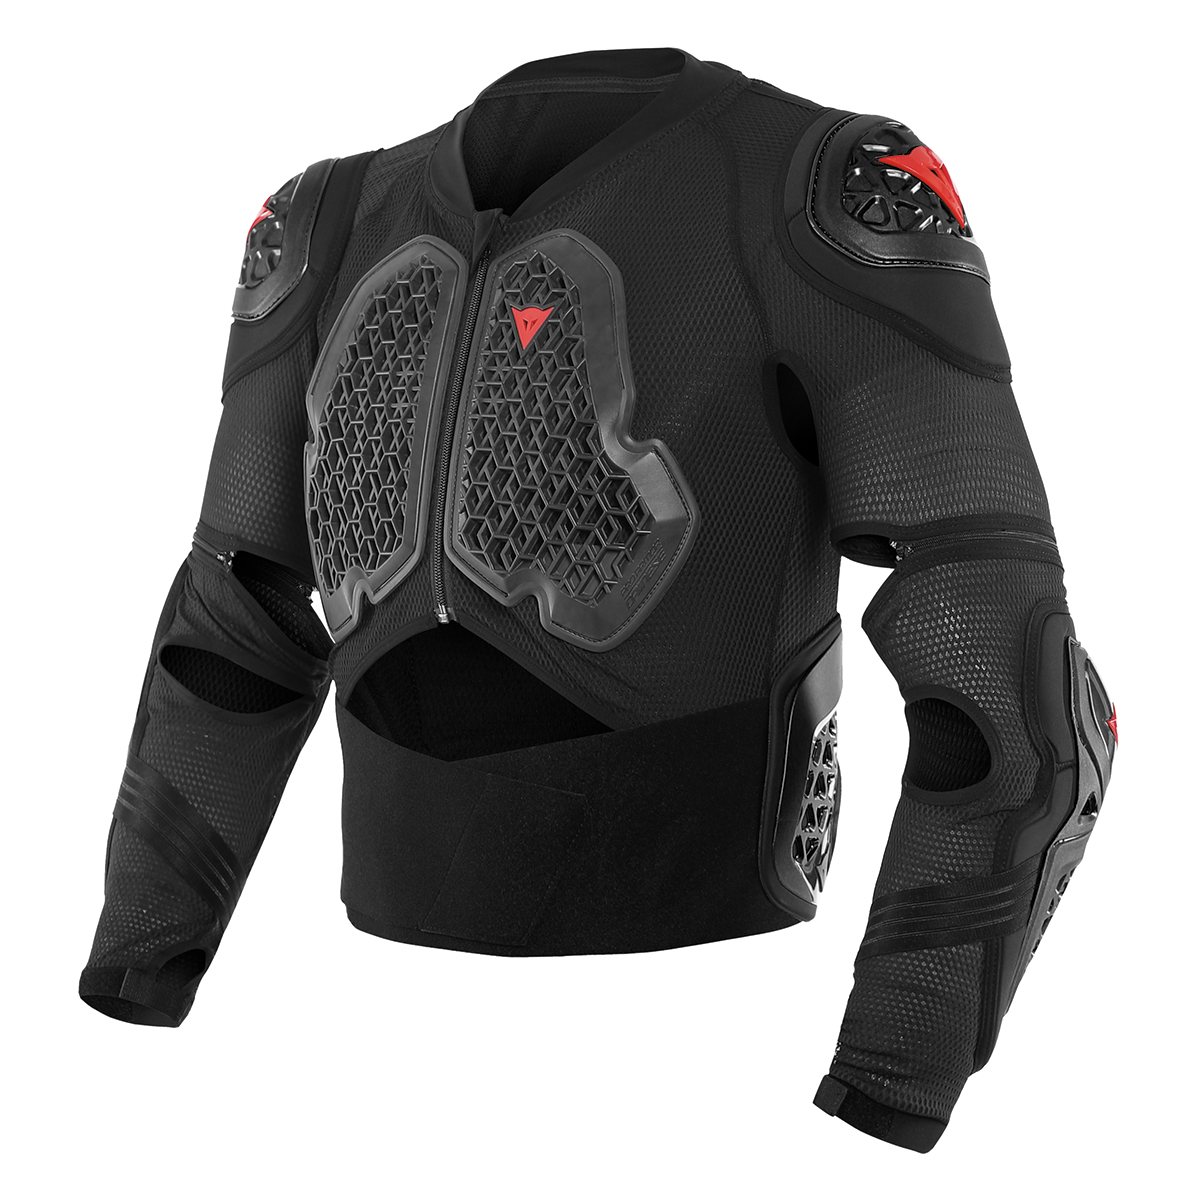 Dainese MX 1 Bodyprotector Black